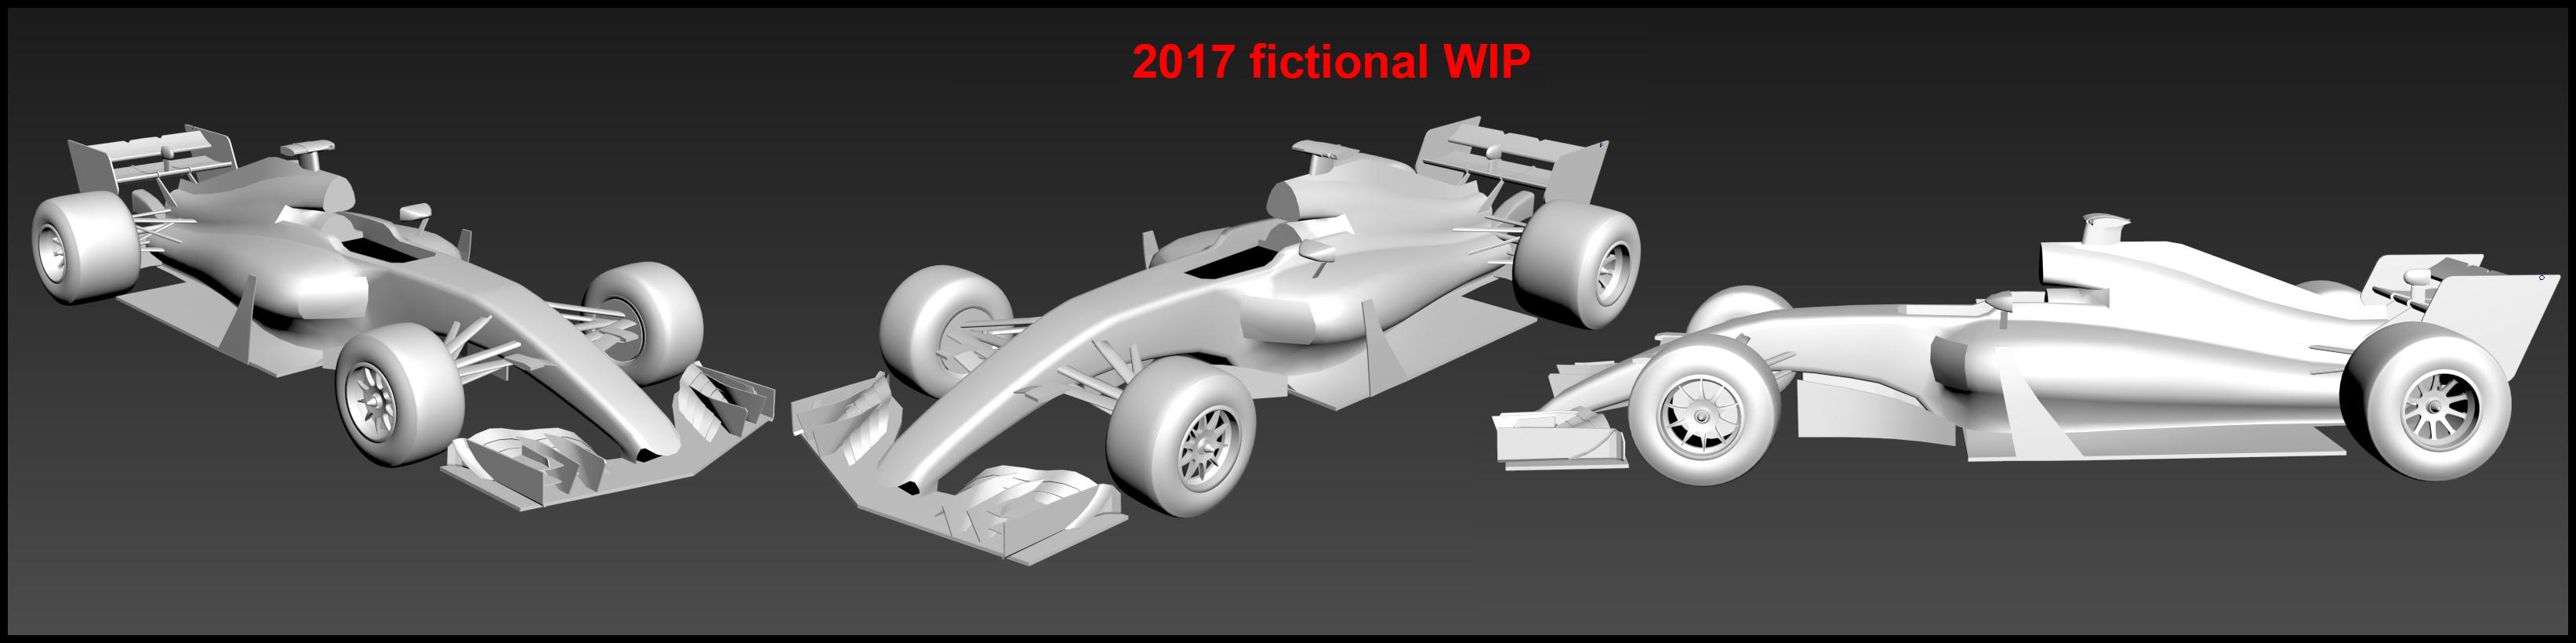 2017_fictional_WIP.jpg